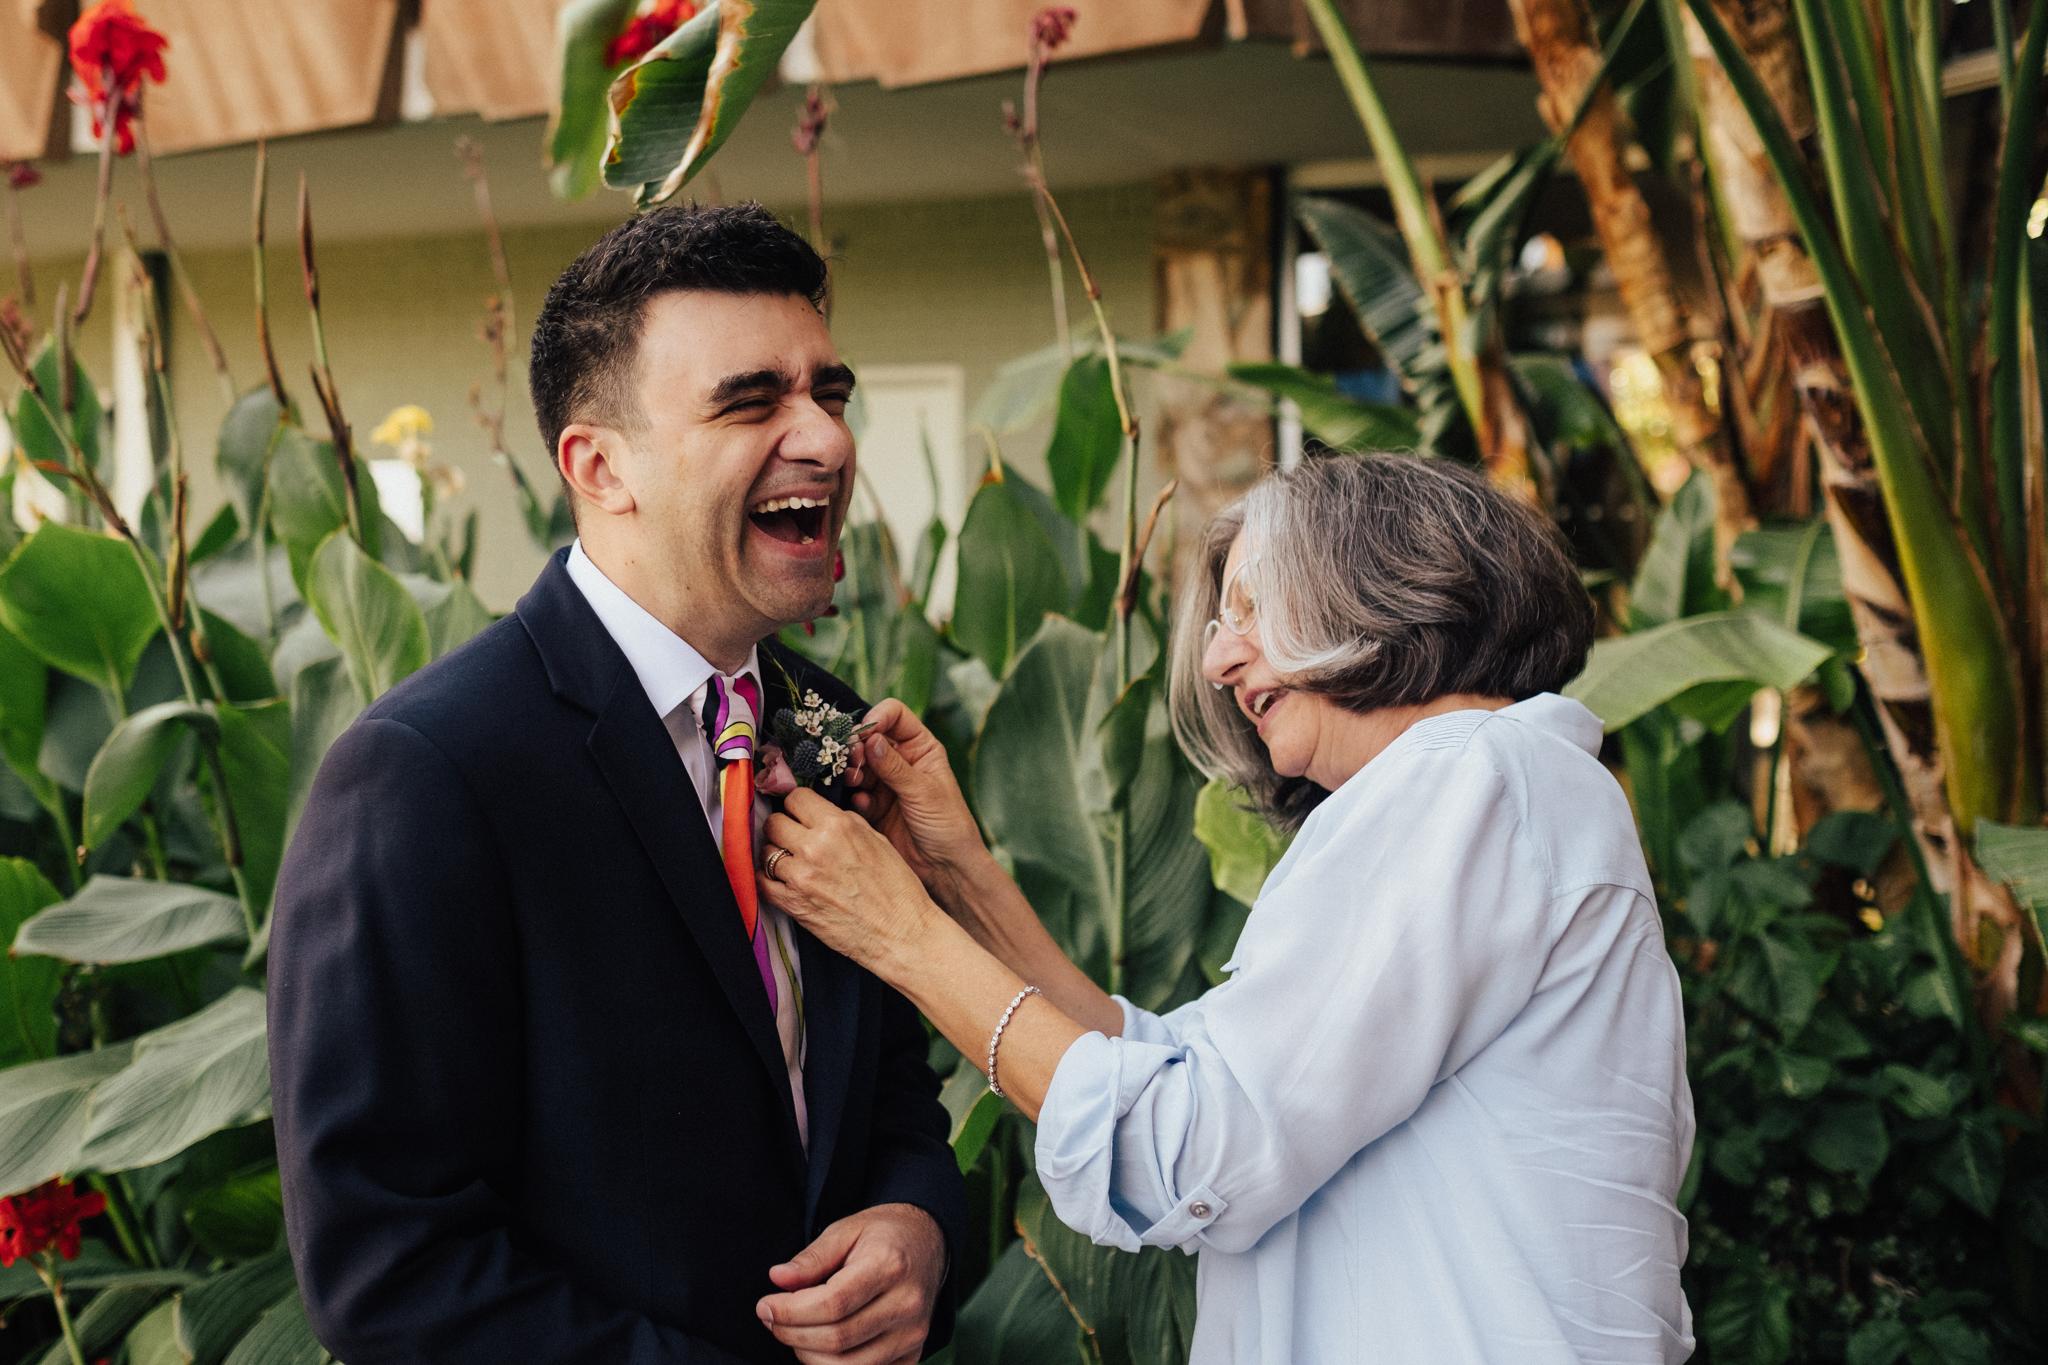 Arizona-Adventure-Elopement-Wedding-Photographer-52.jpg